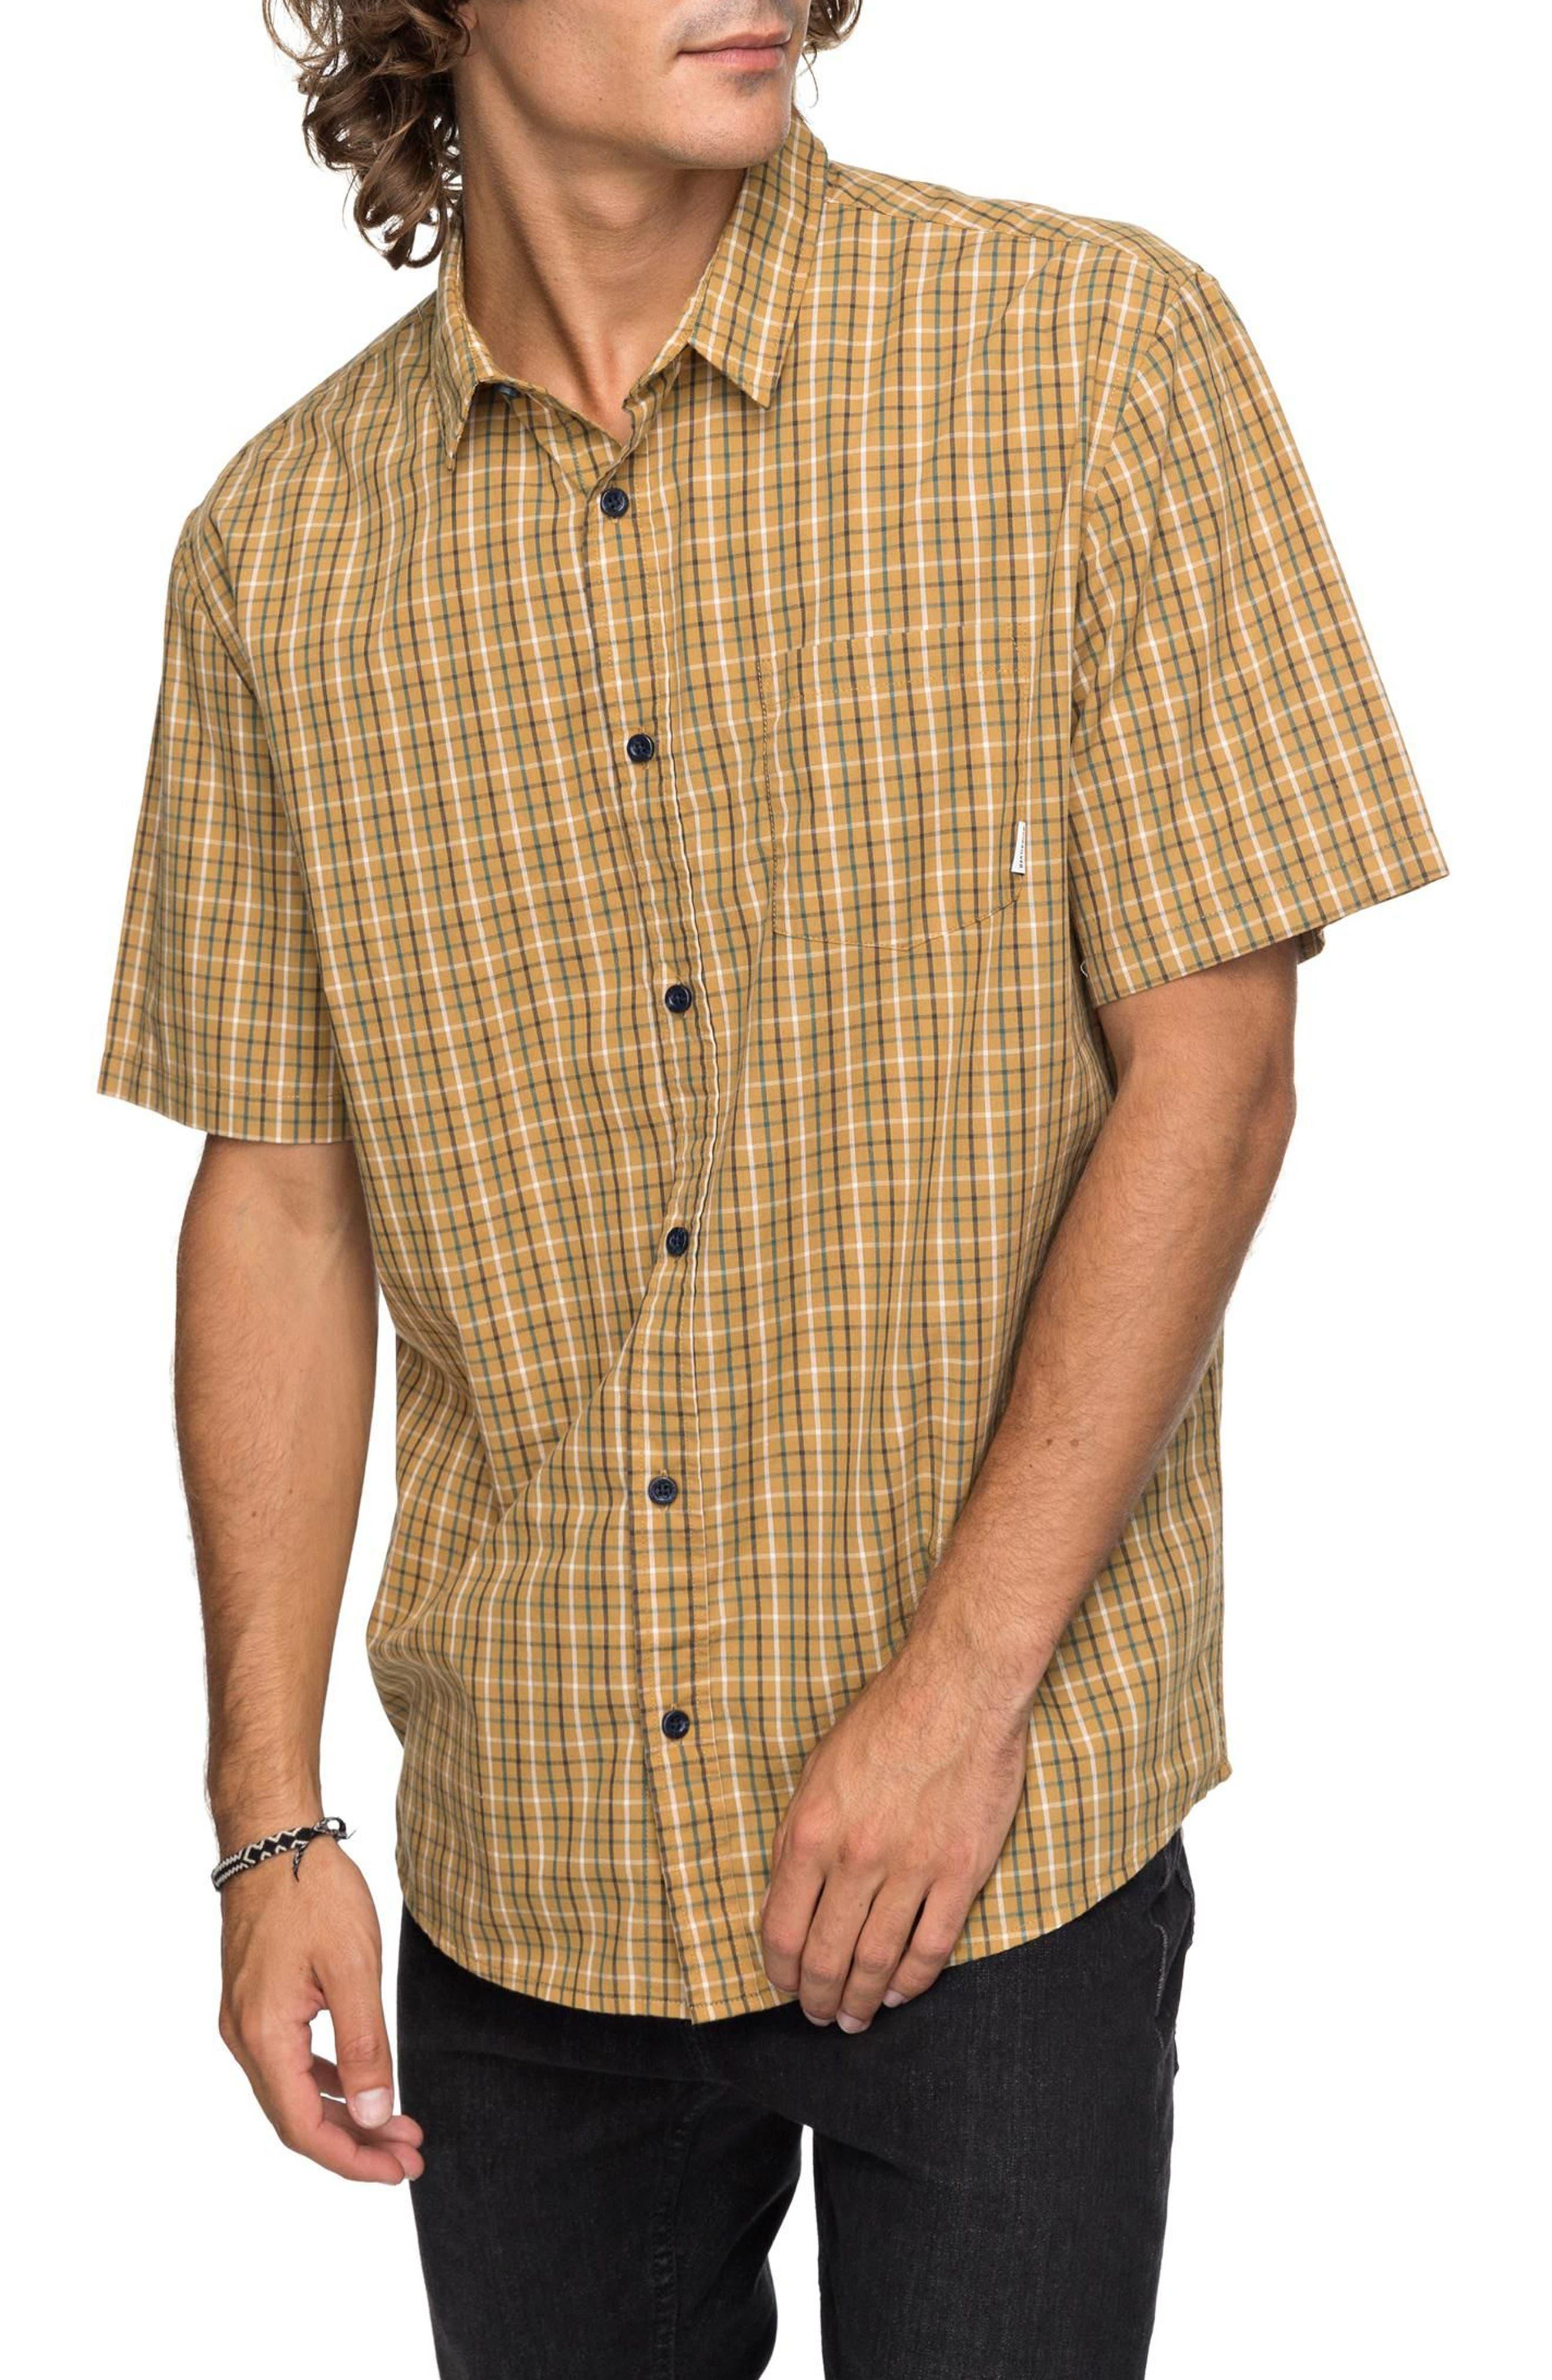 Moon Rythm Short Sleeve Shirt,                             Main thumbnail 1, color,                             217